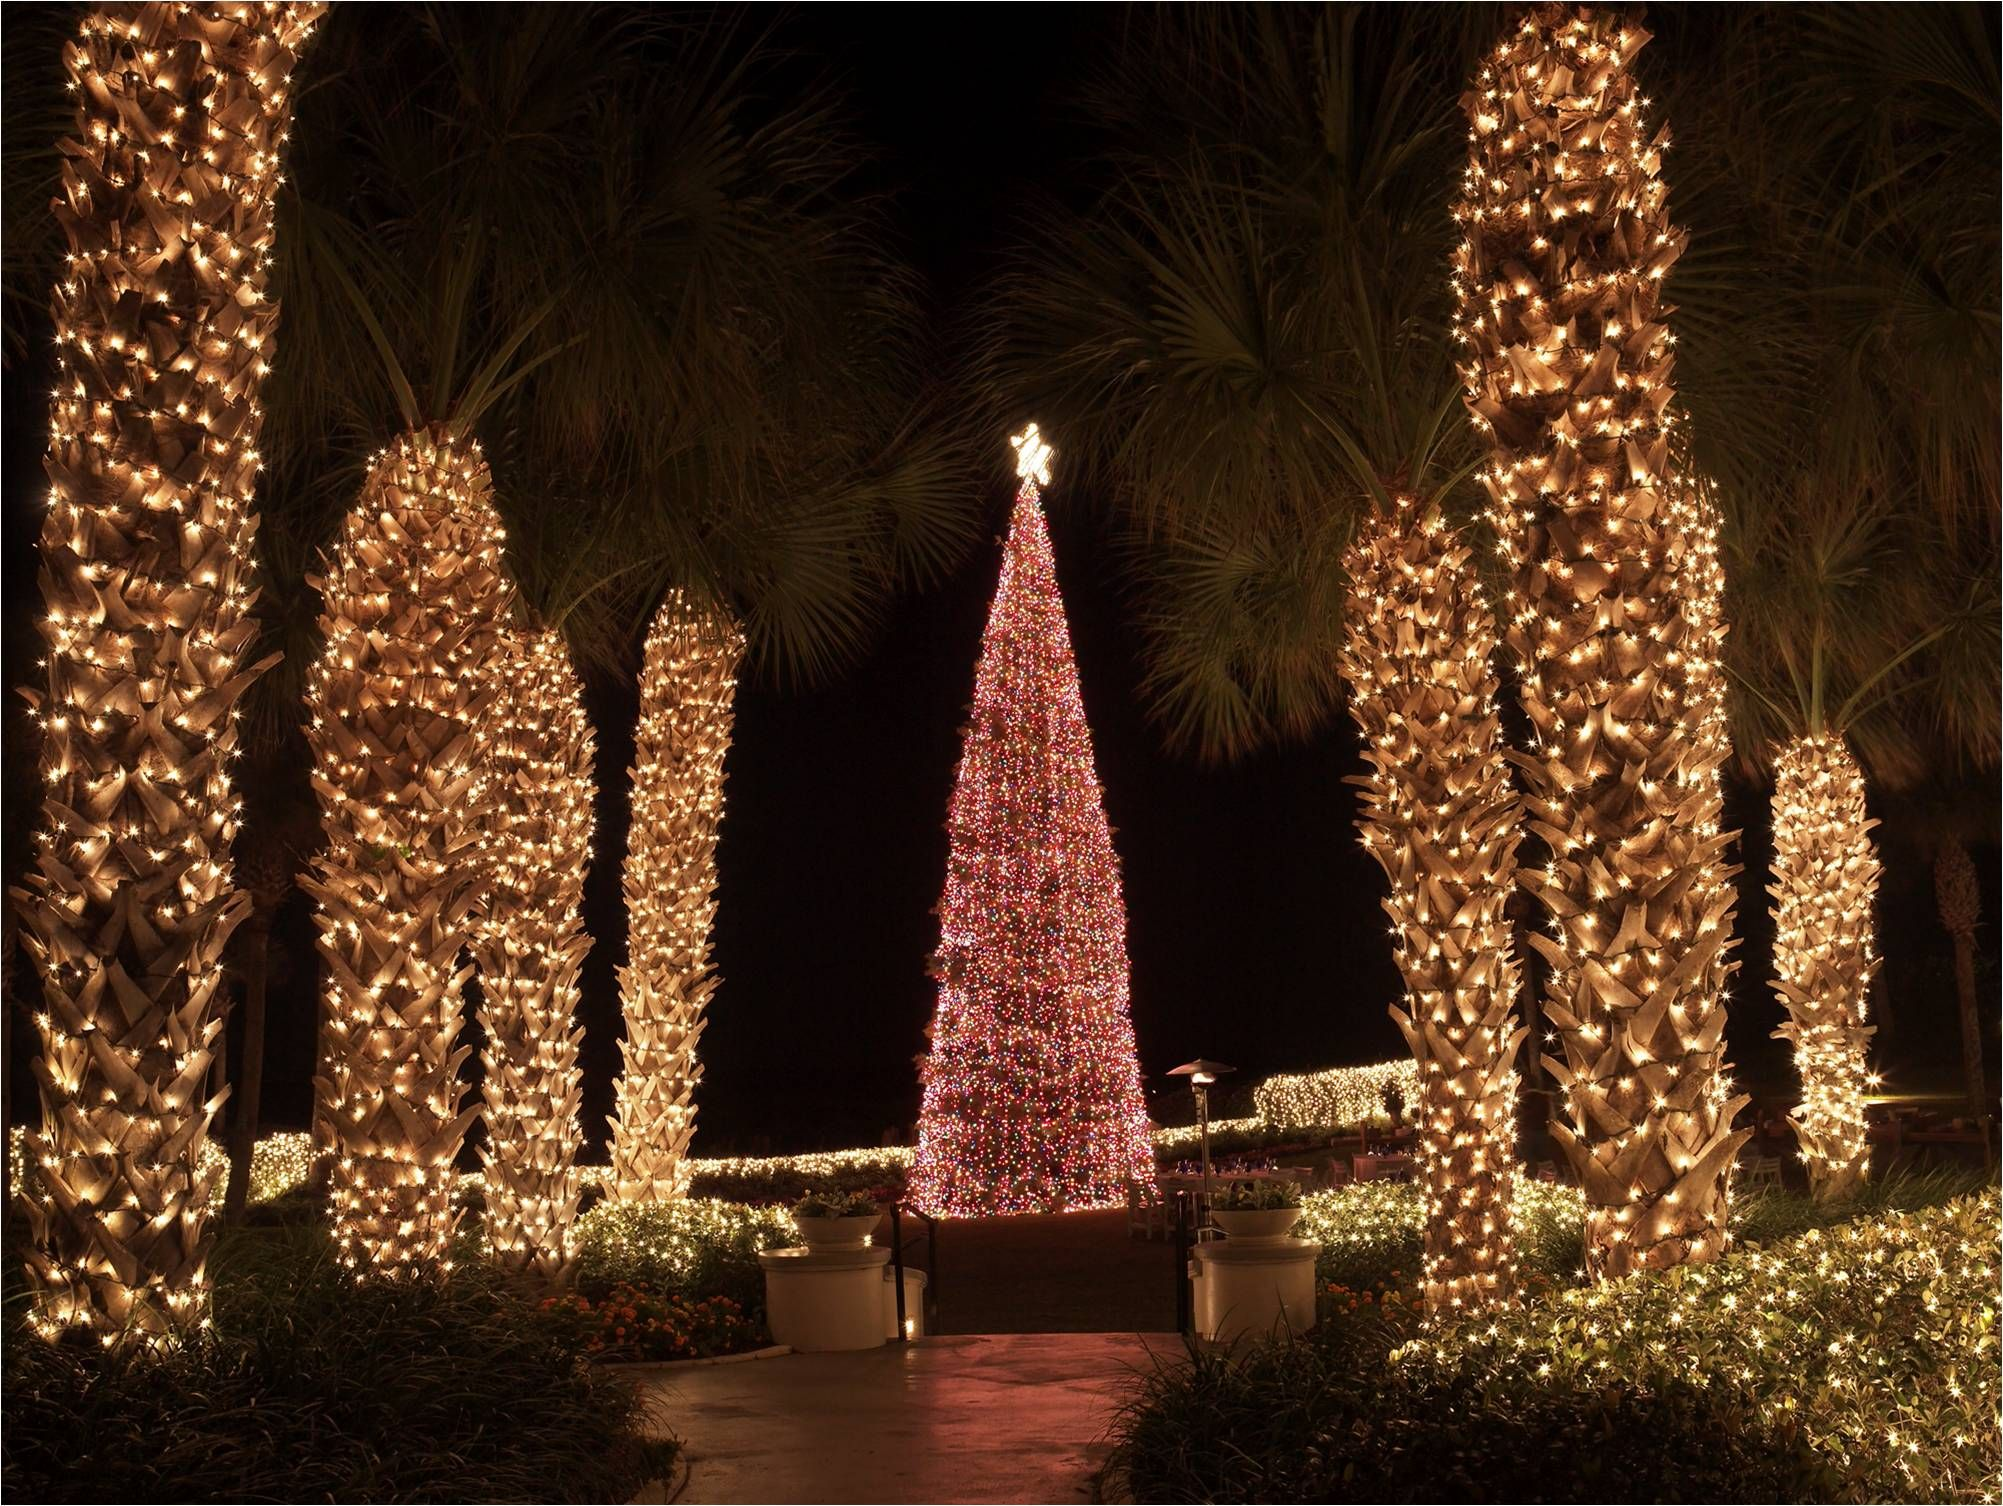 Amelia island christmas tree lighting at amelia island plantation - Christmas Tree Lighting At The Ritz Carlton Amelia Island